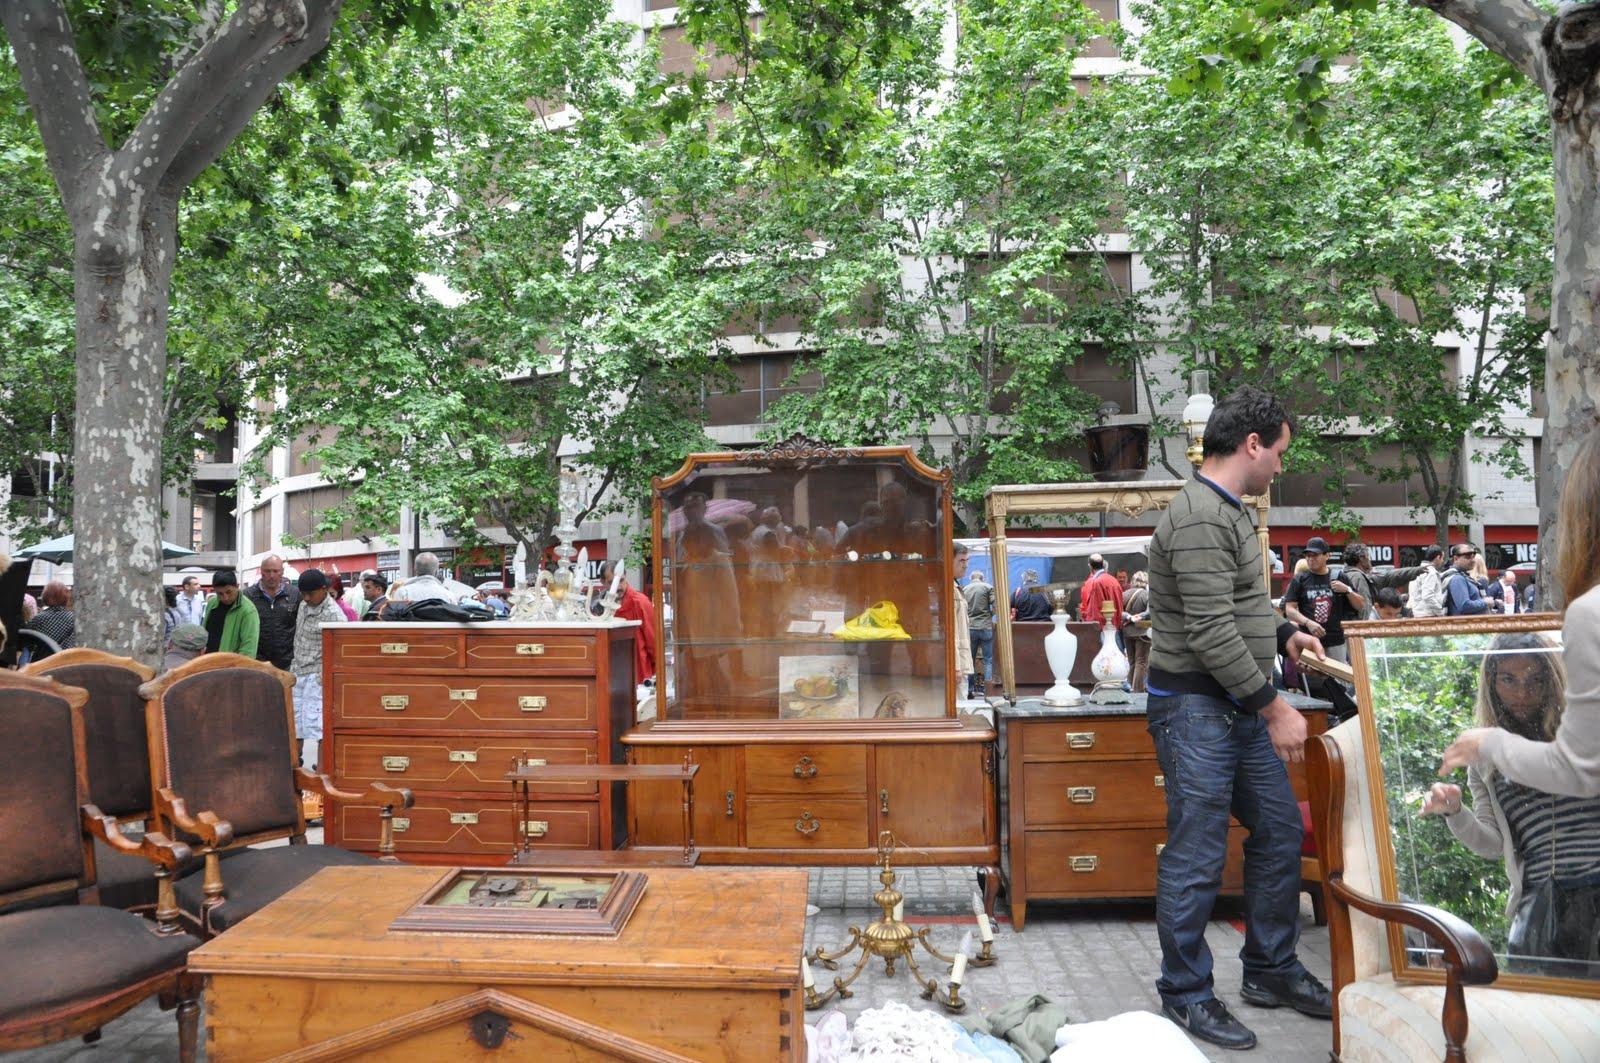 Esp ritu chamarilero de rastro por valencia for Mercadillo del mueble merida